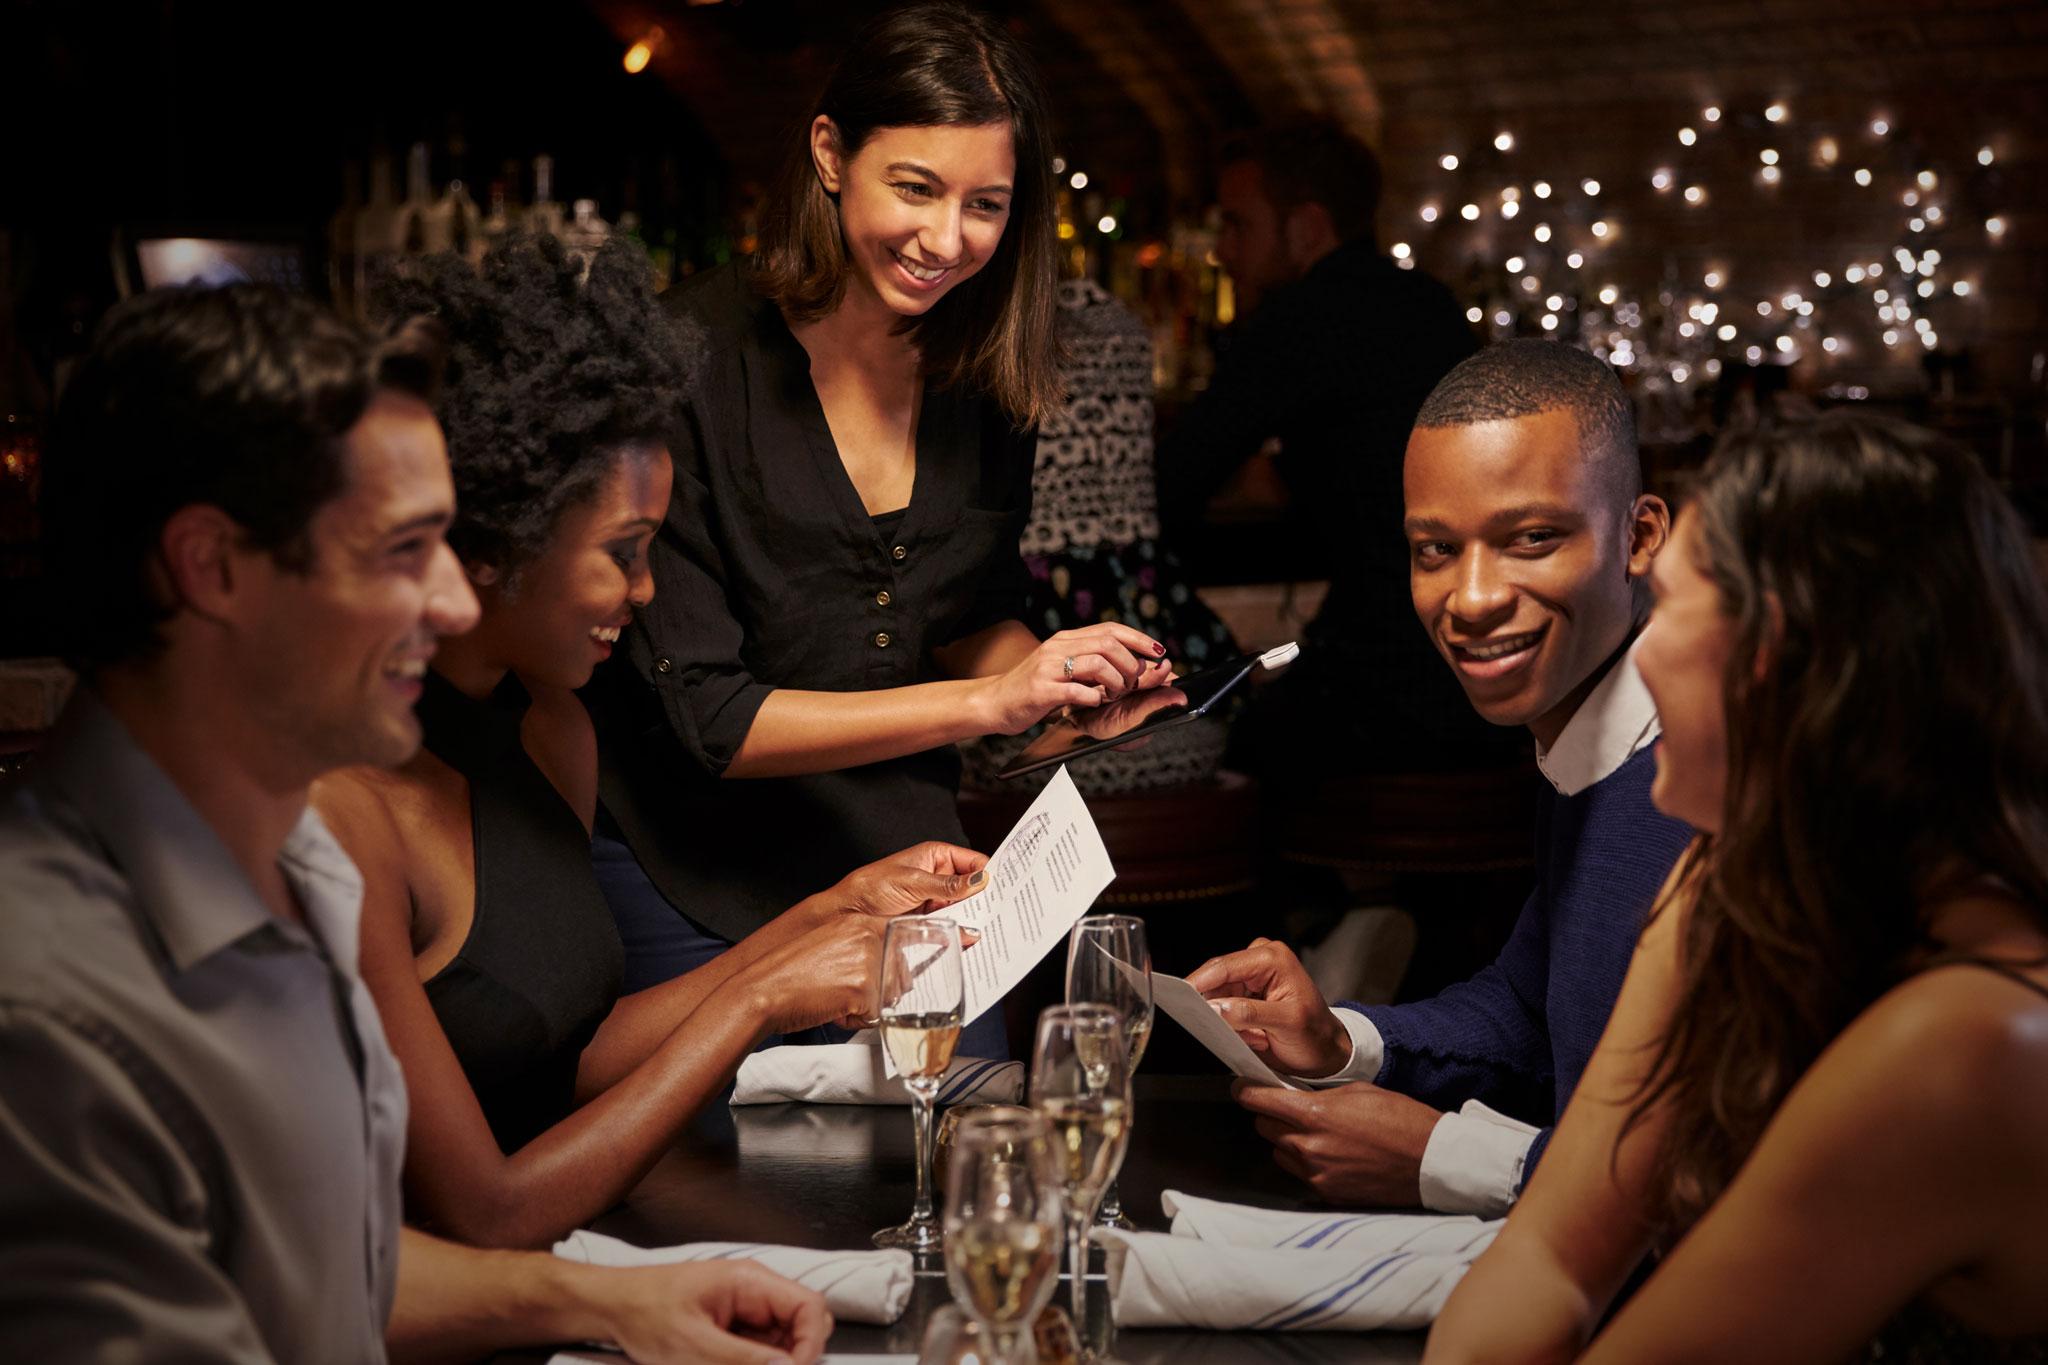 Benefits-happy-employees-customers.jpg